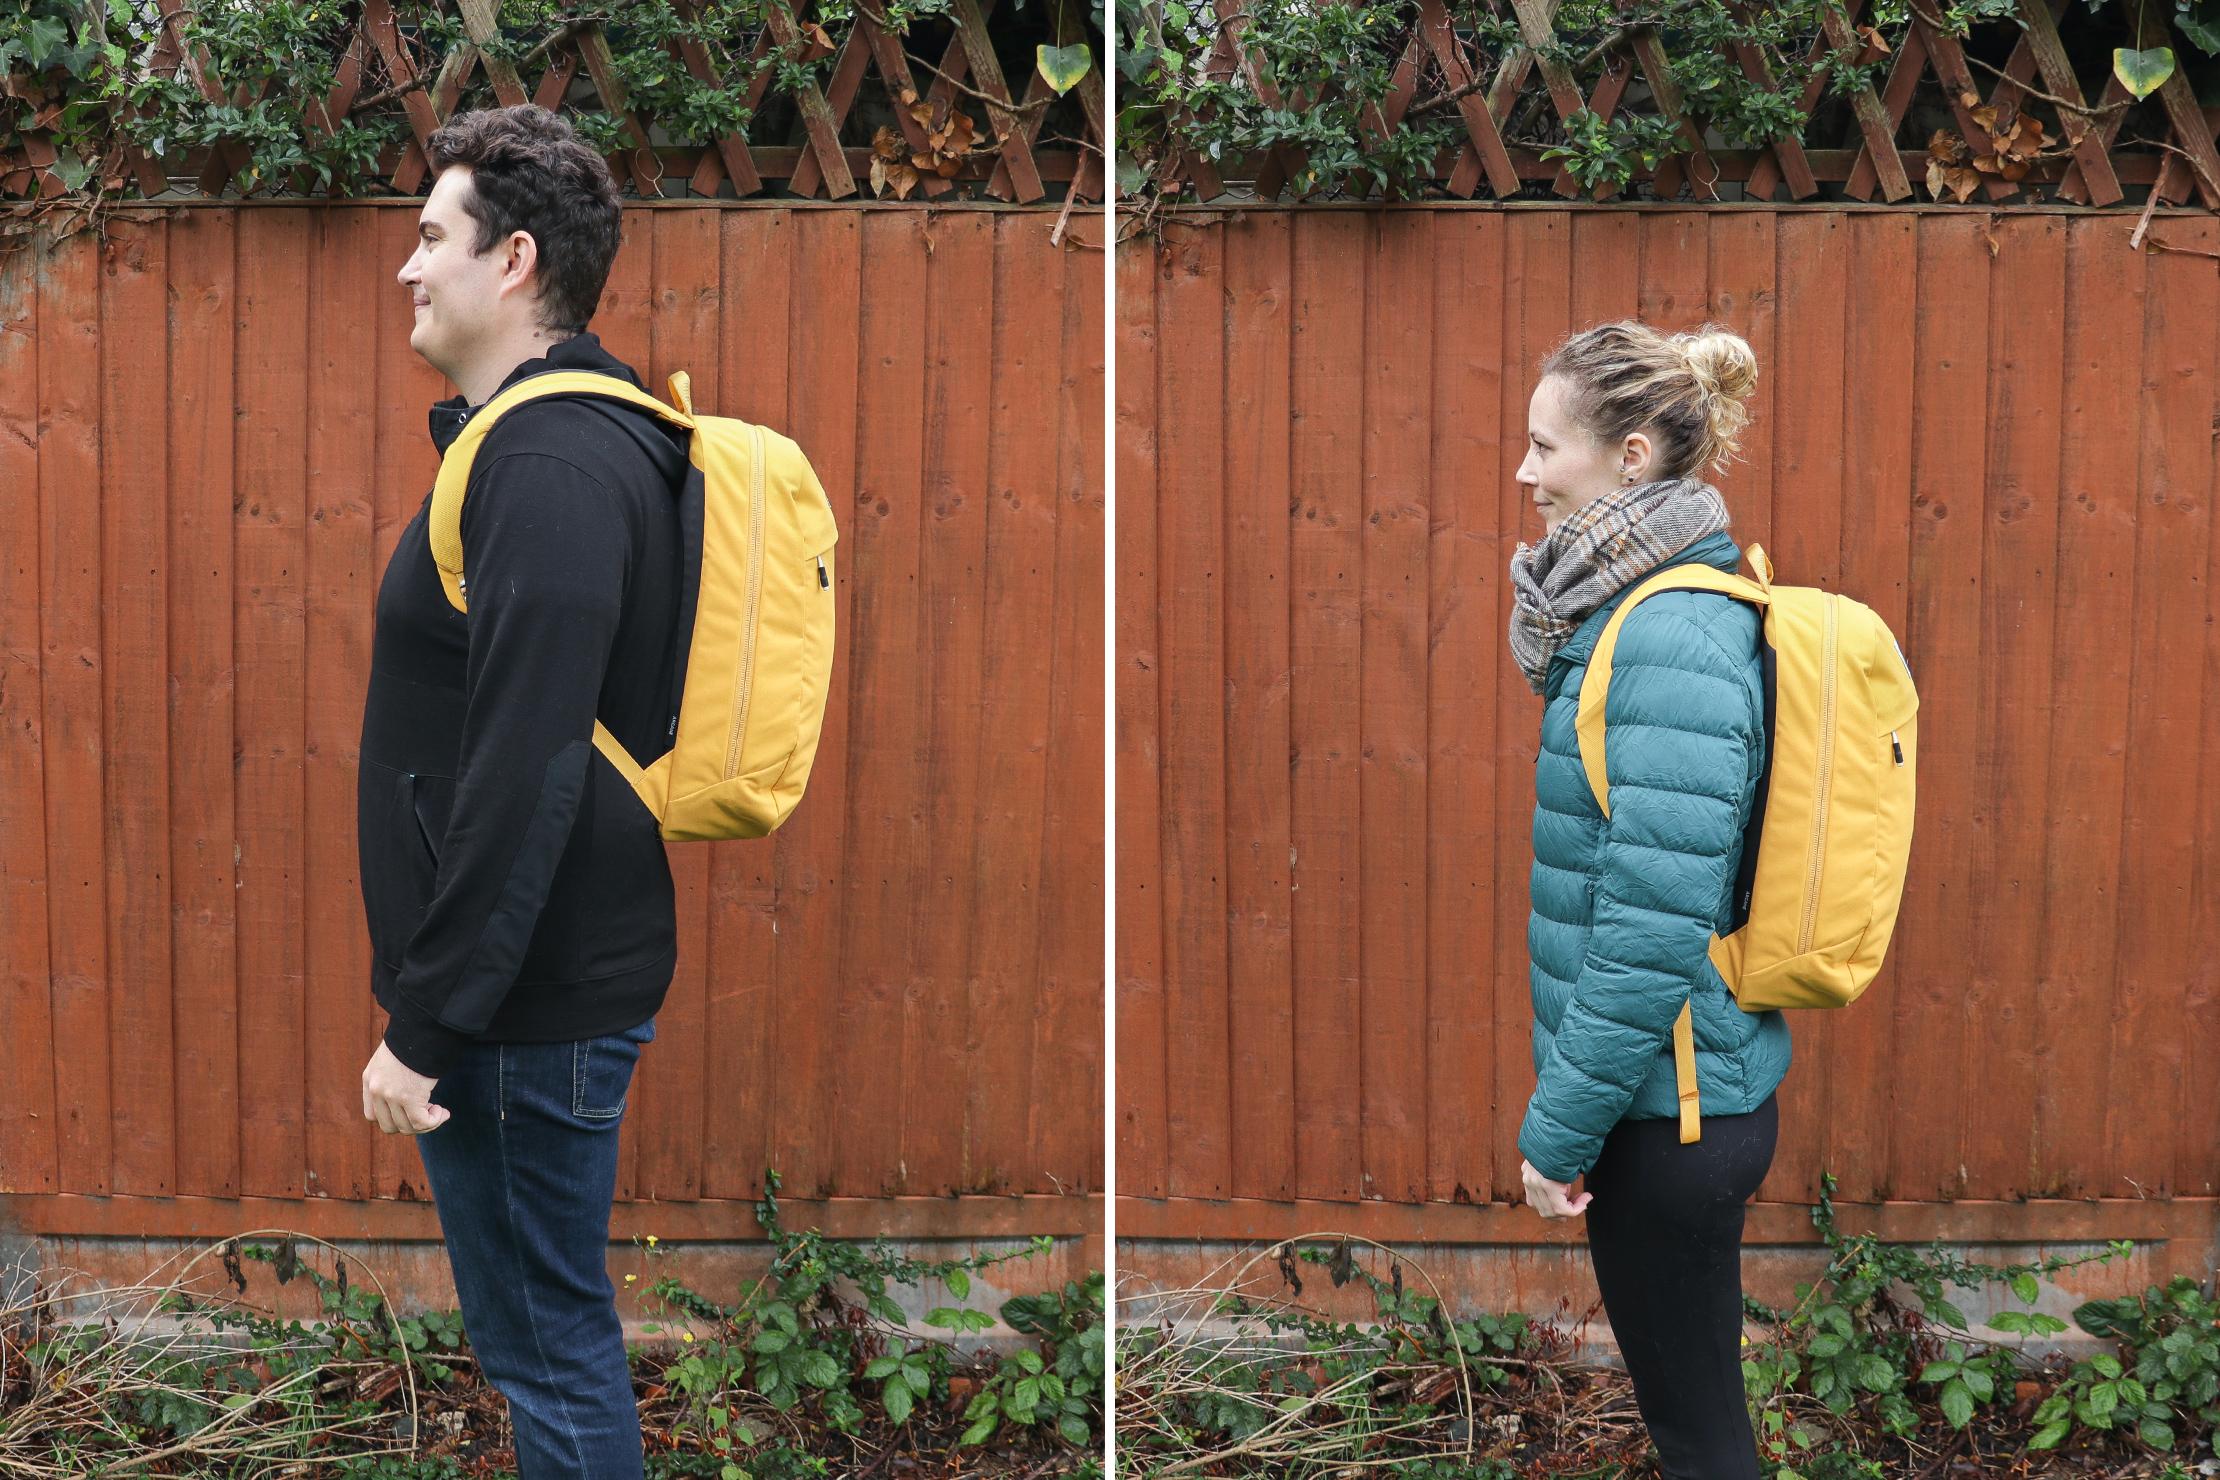 "Left: Nathan, Height: 6'4"" (193 cm), Torso: 19"" (48 cm) | Right: Rebecca, Height: 5'7"" (170 cm), Torso: 16"" (41 cm)"